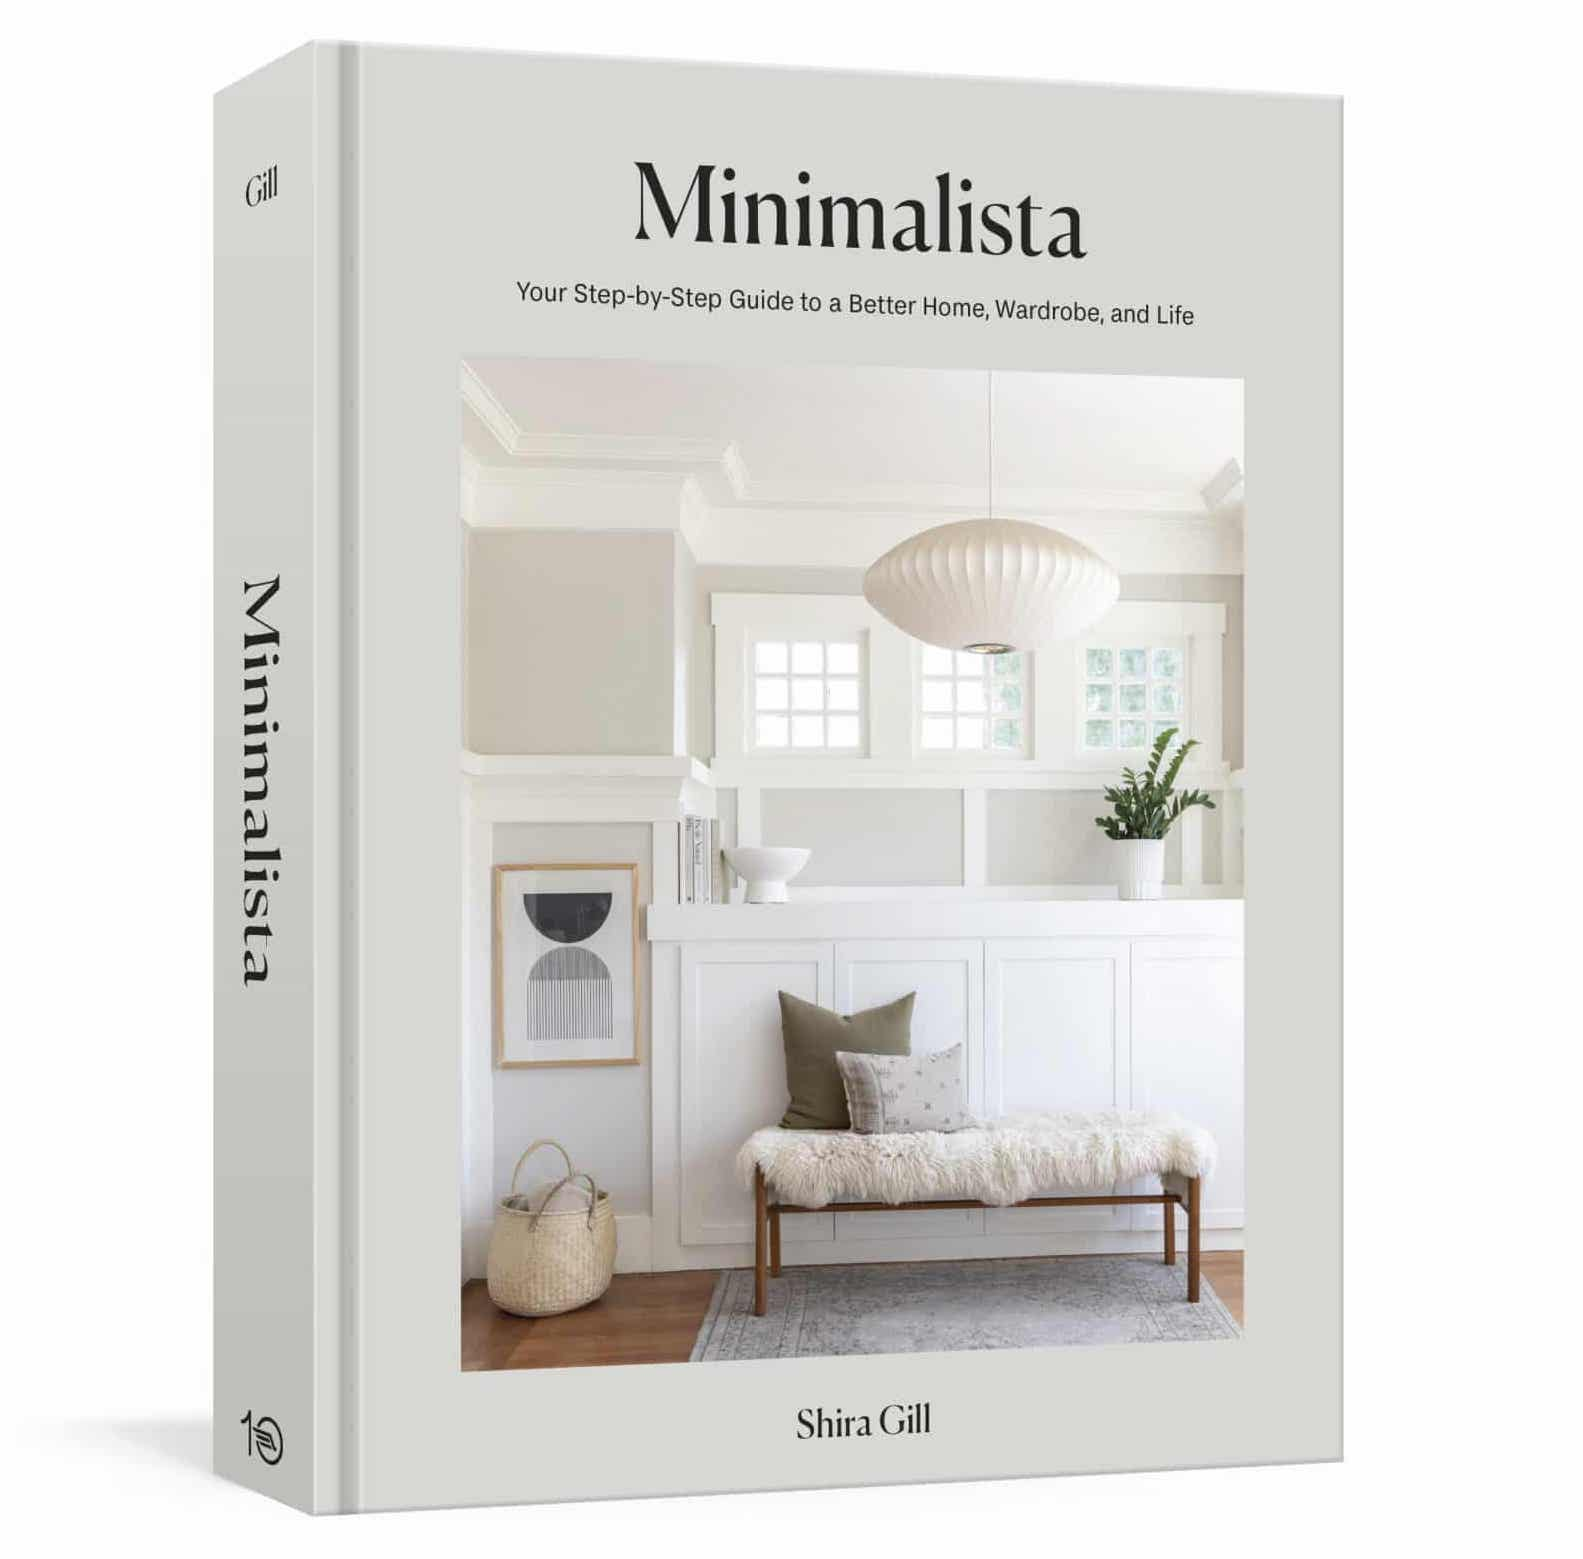 minimalista book